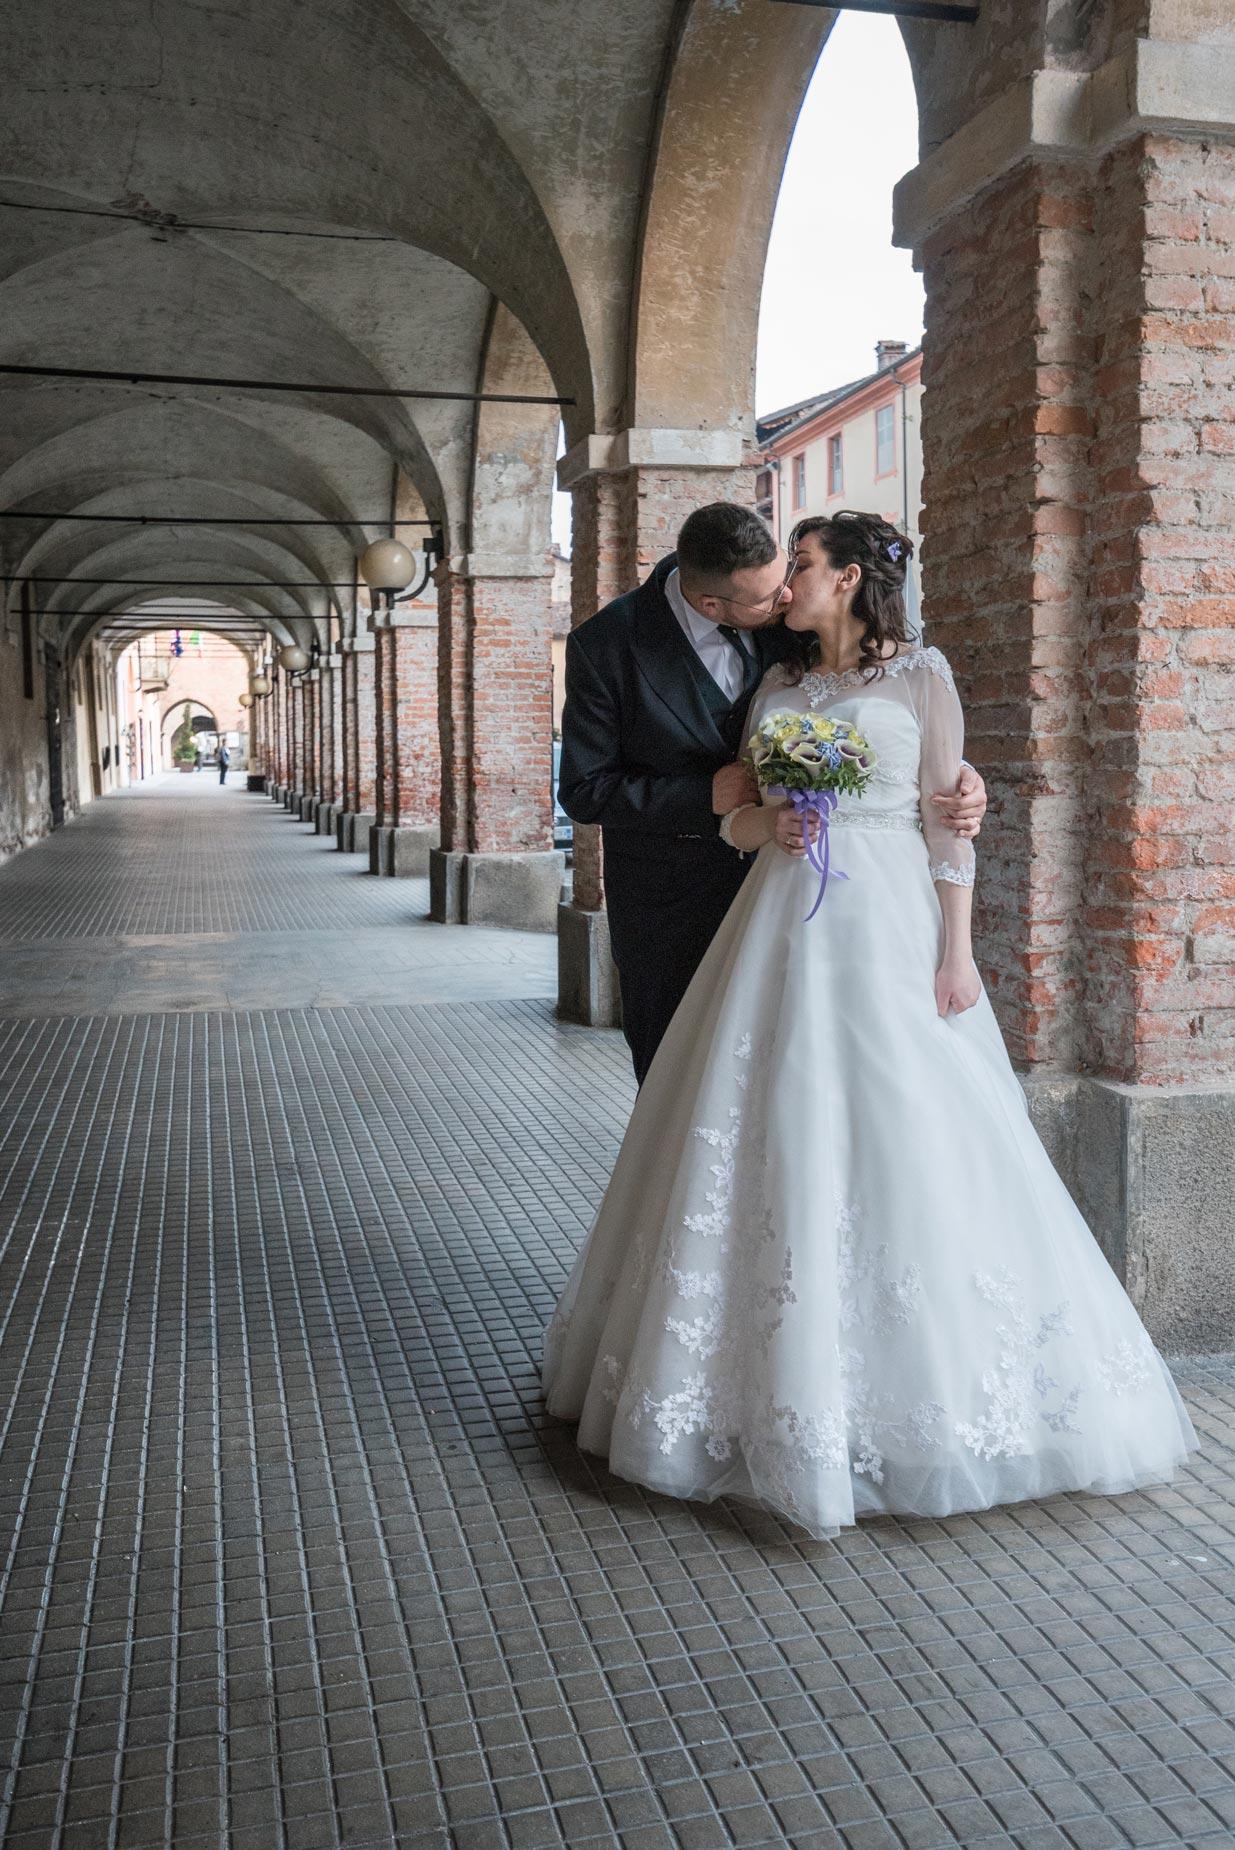 Matrimonio a Narzole Lorenza Diego - DSC 0766 - Servizio fotografico matrimonio - Servizio fotografico matrimonio